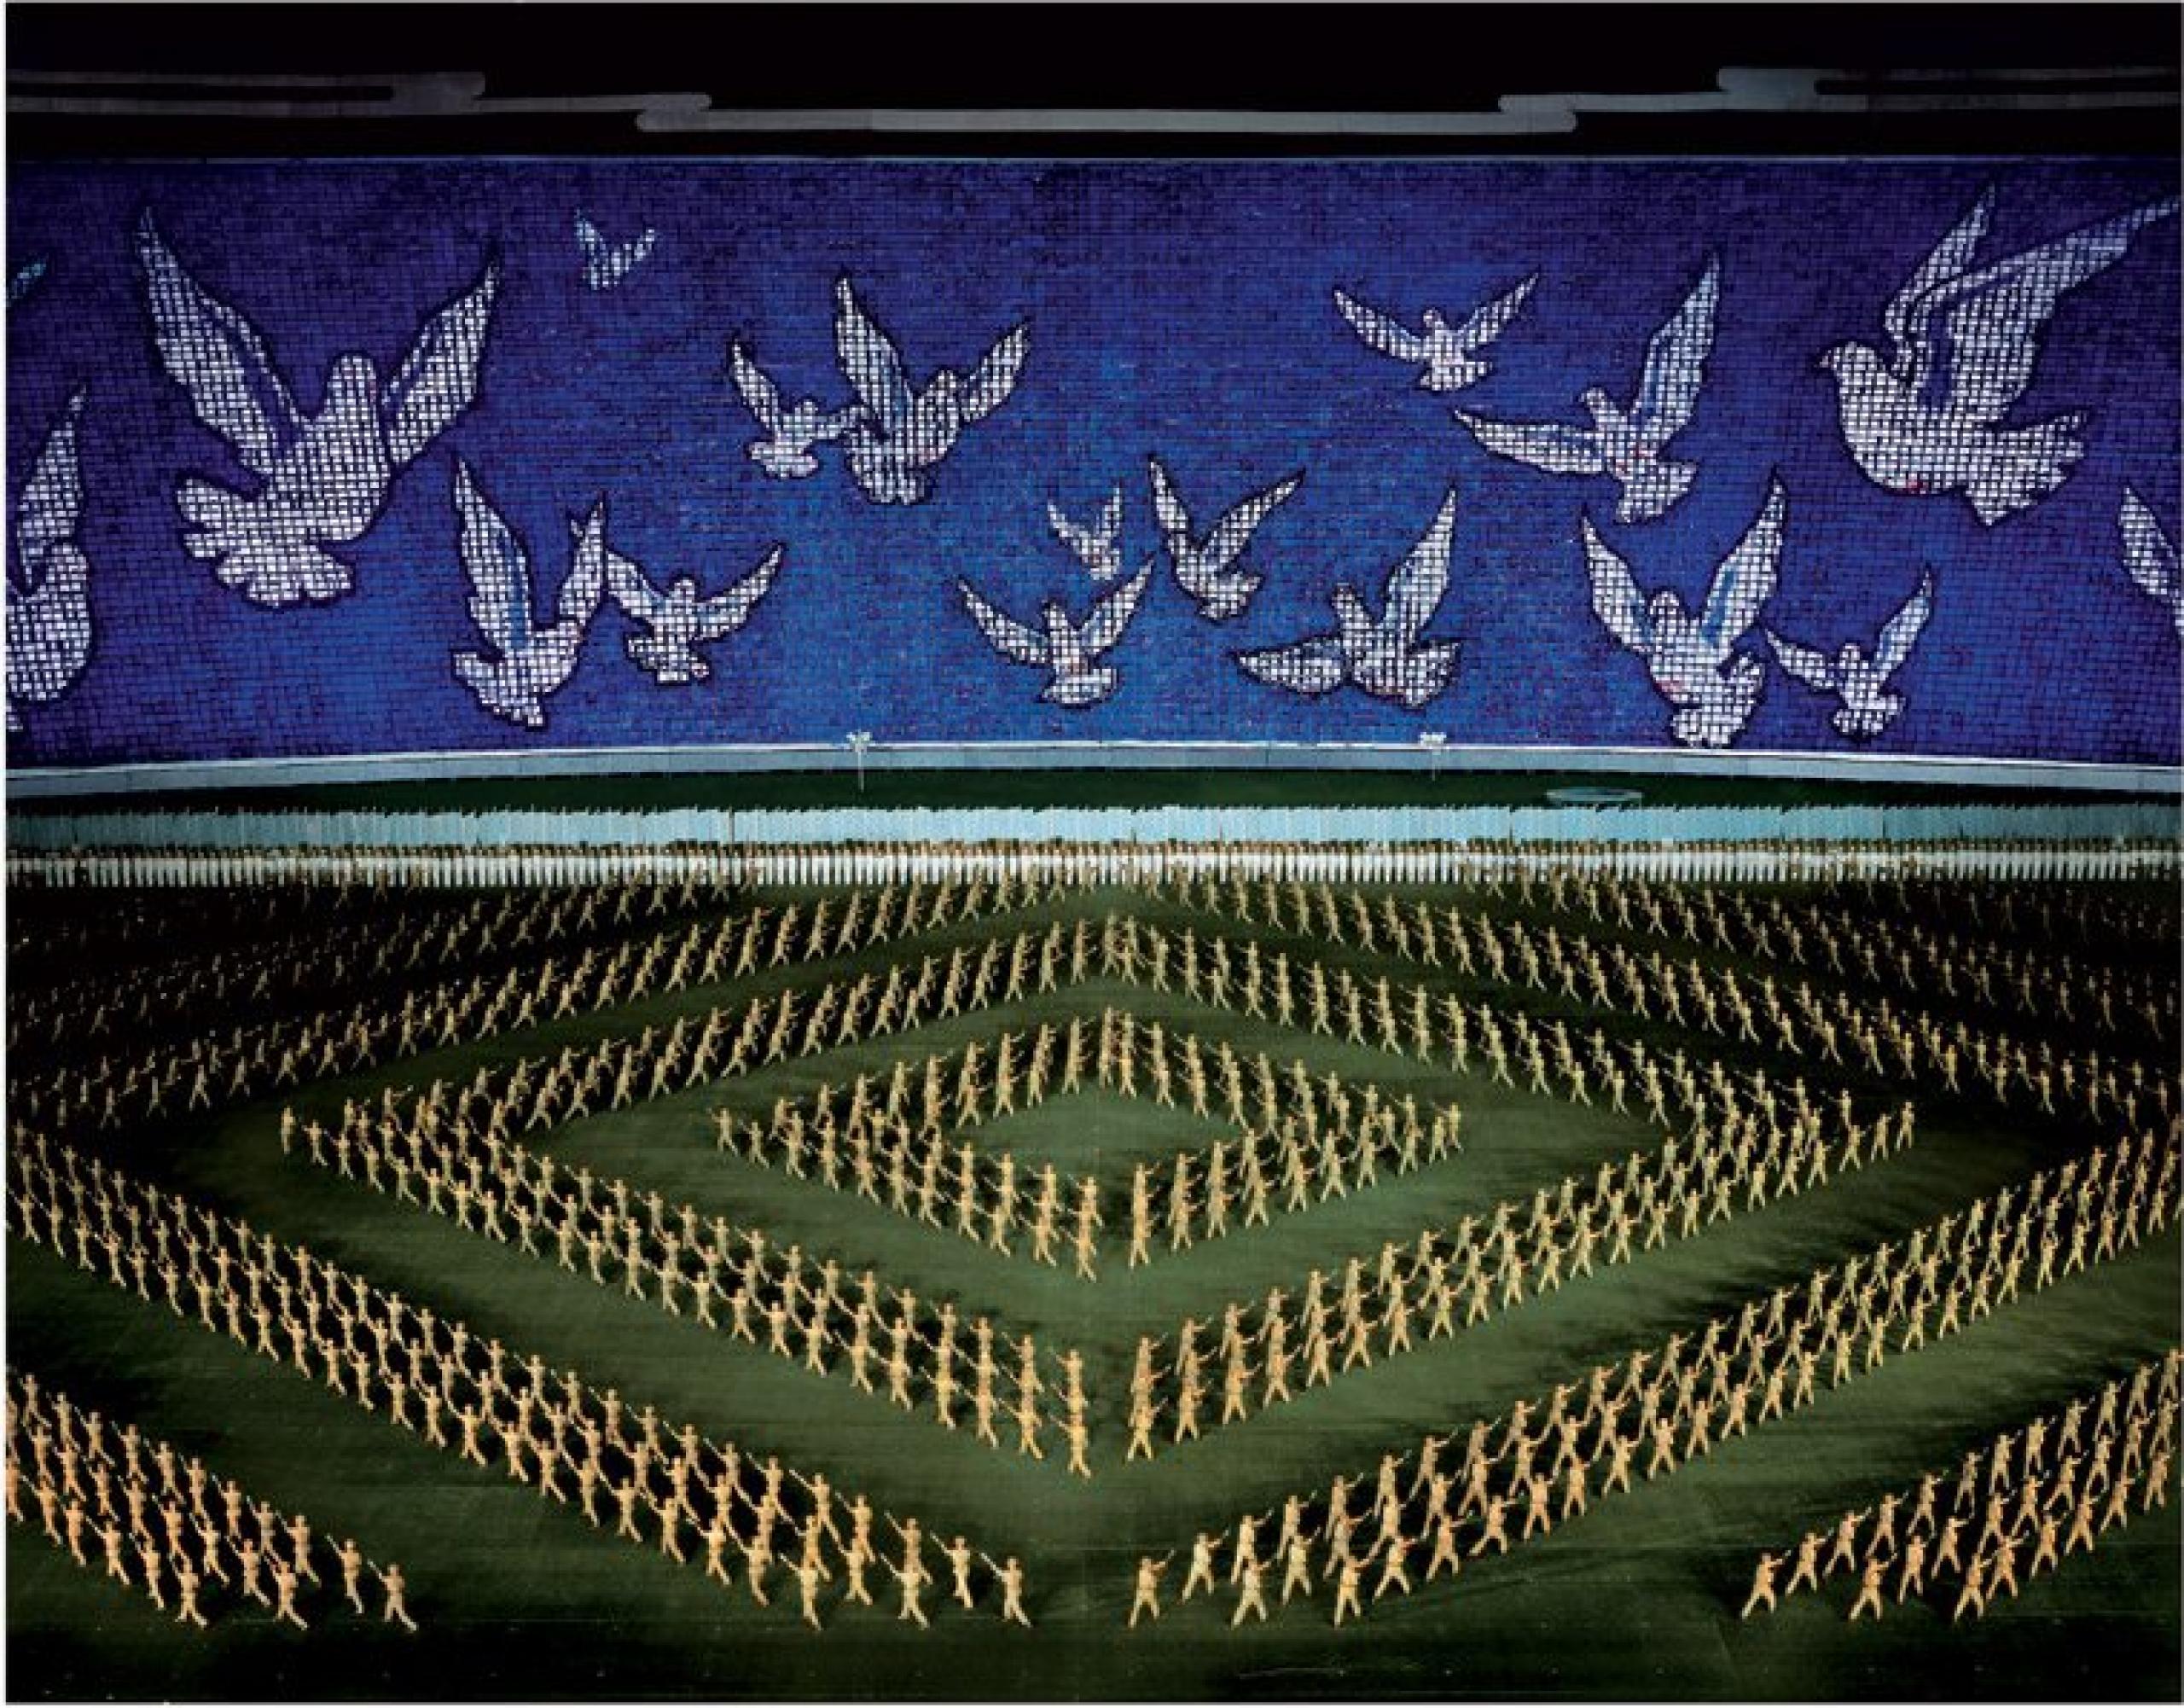 Andreas Gursky Pyongjang II Diptychon (2007, detail)